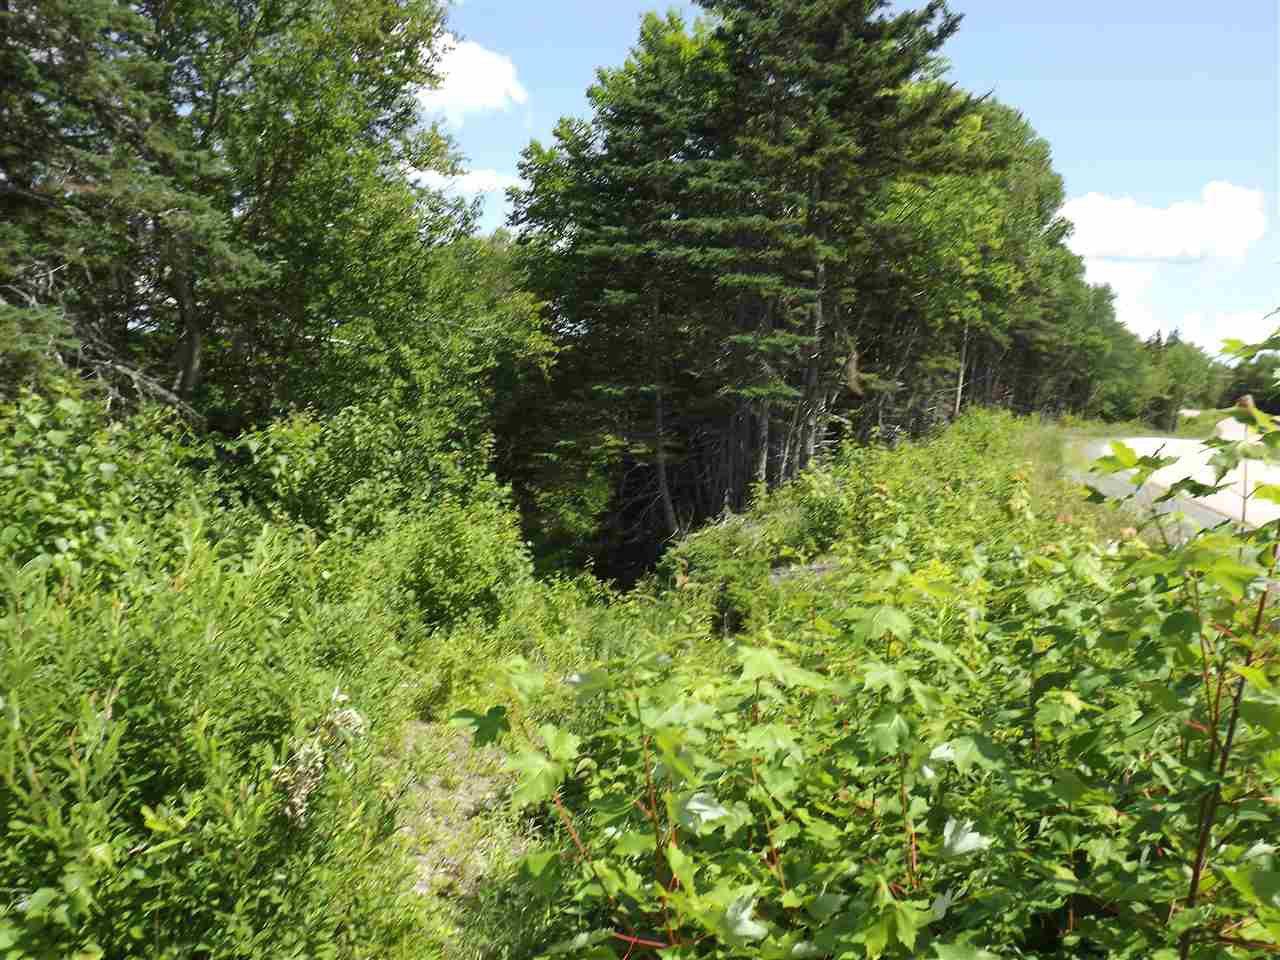 Photo 10: Photos: Trout Brook Road in Albert Bridge: 210-Marion Bridge Vacant Land for sale (Cape Breton)  : MLS®# 201919549